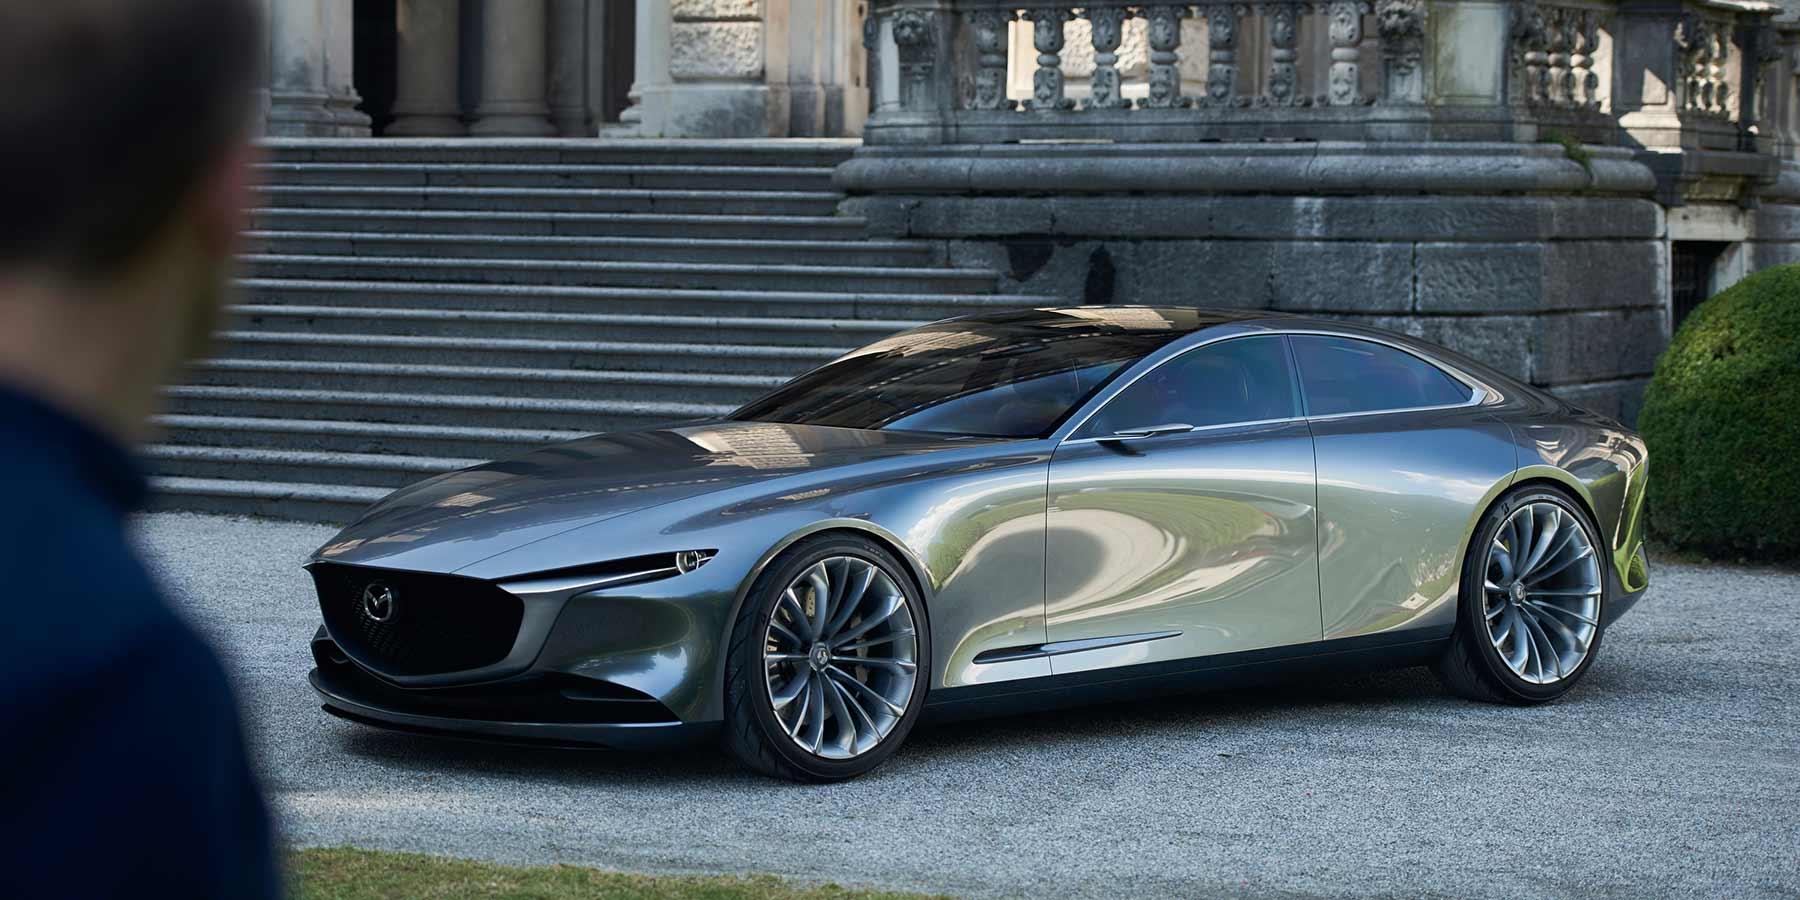 Mazda propulsion